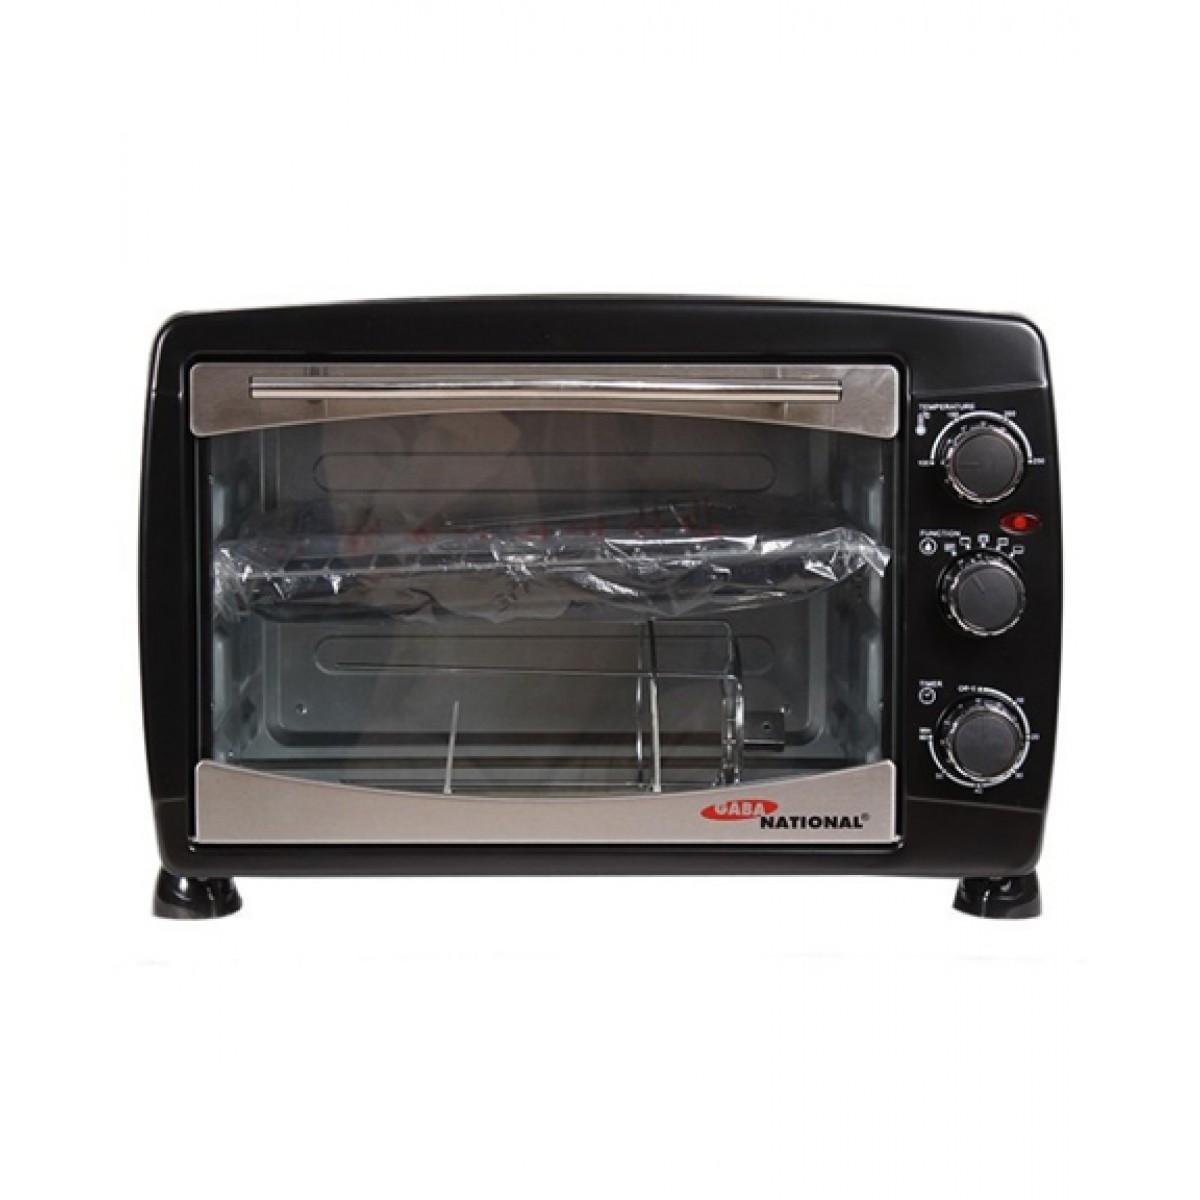 Gaba National Oven Toaster 28Ltr (GNO-1528)